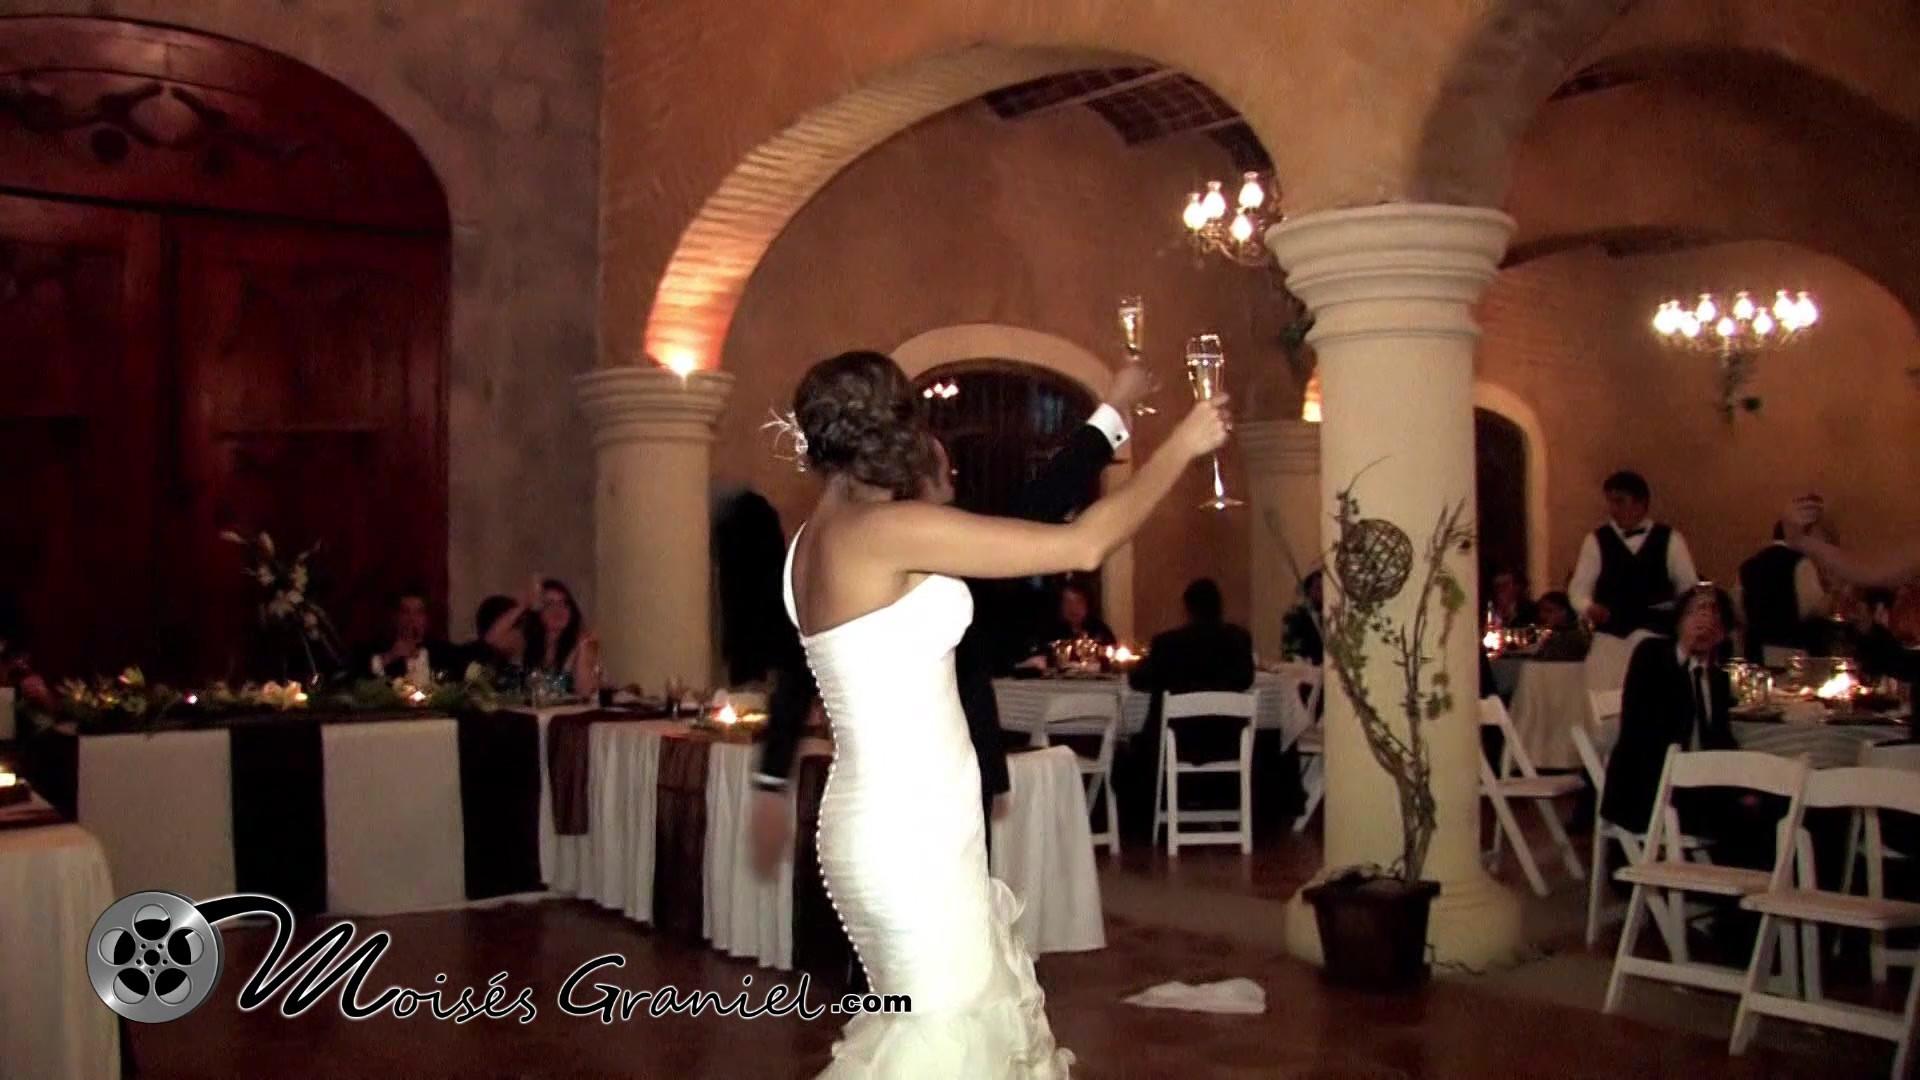 Next day Edit Venezuela wedding.mp4